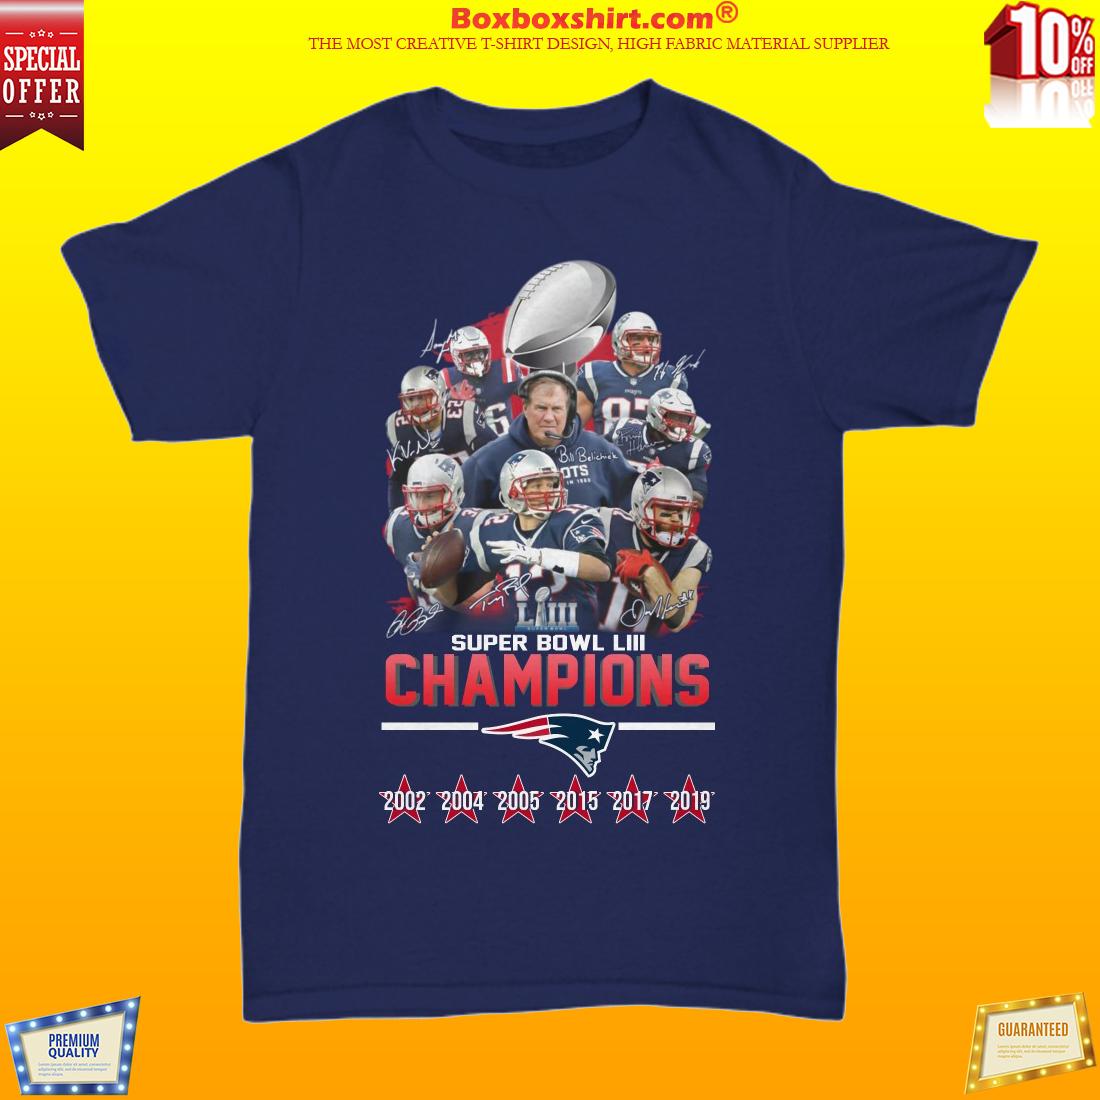 Patriots Super Bowl LIII champions unisex shirt